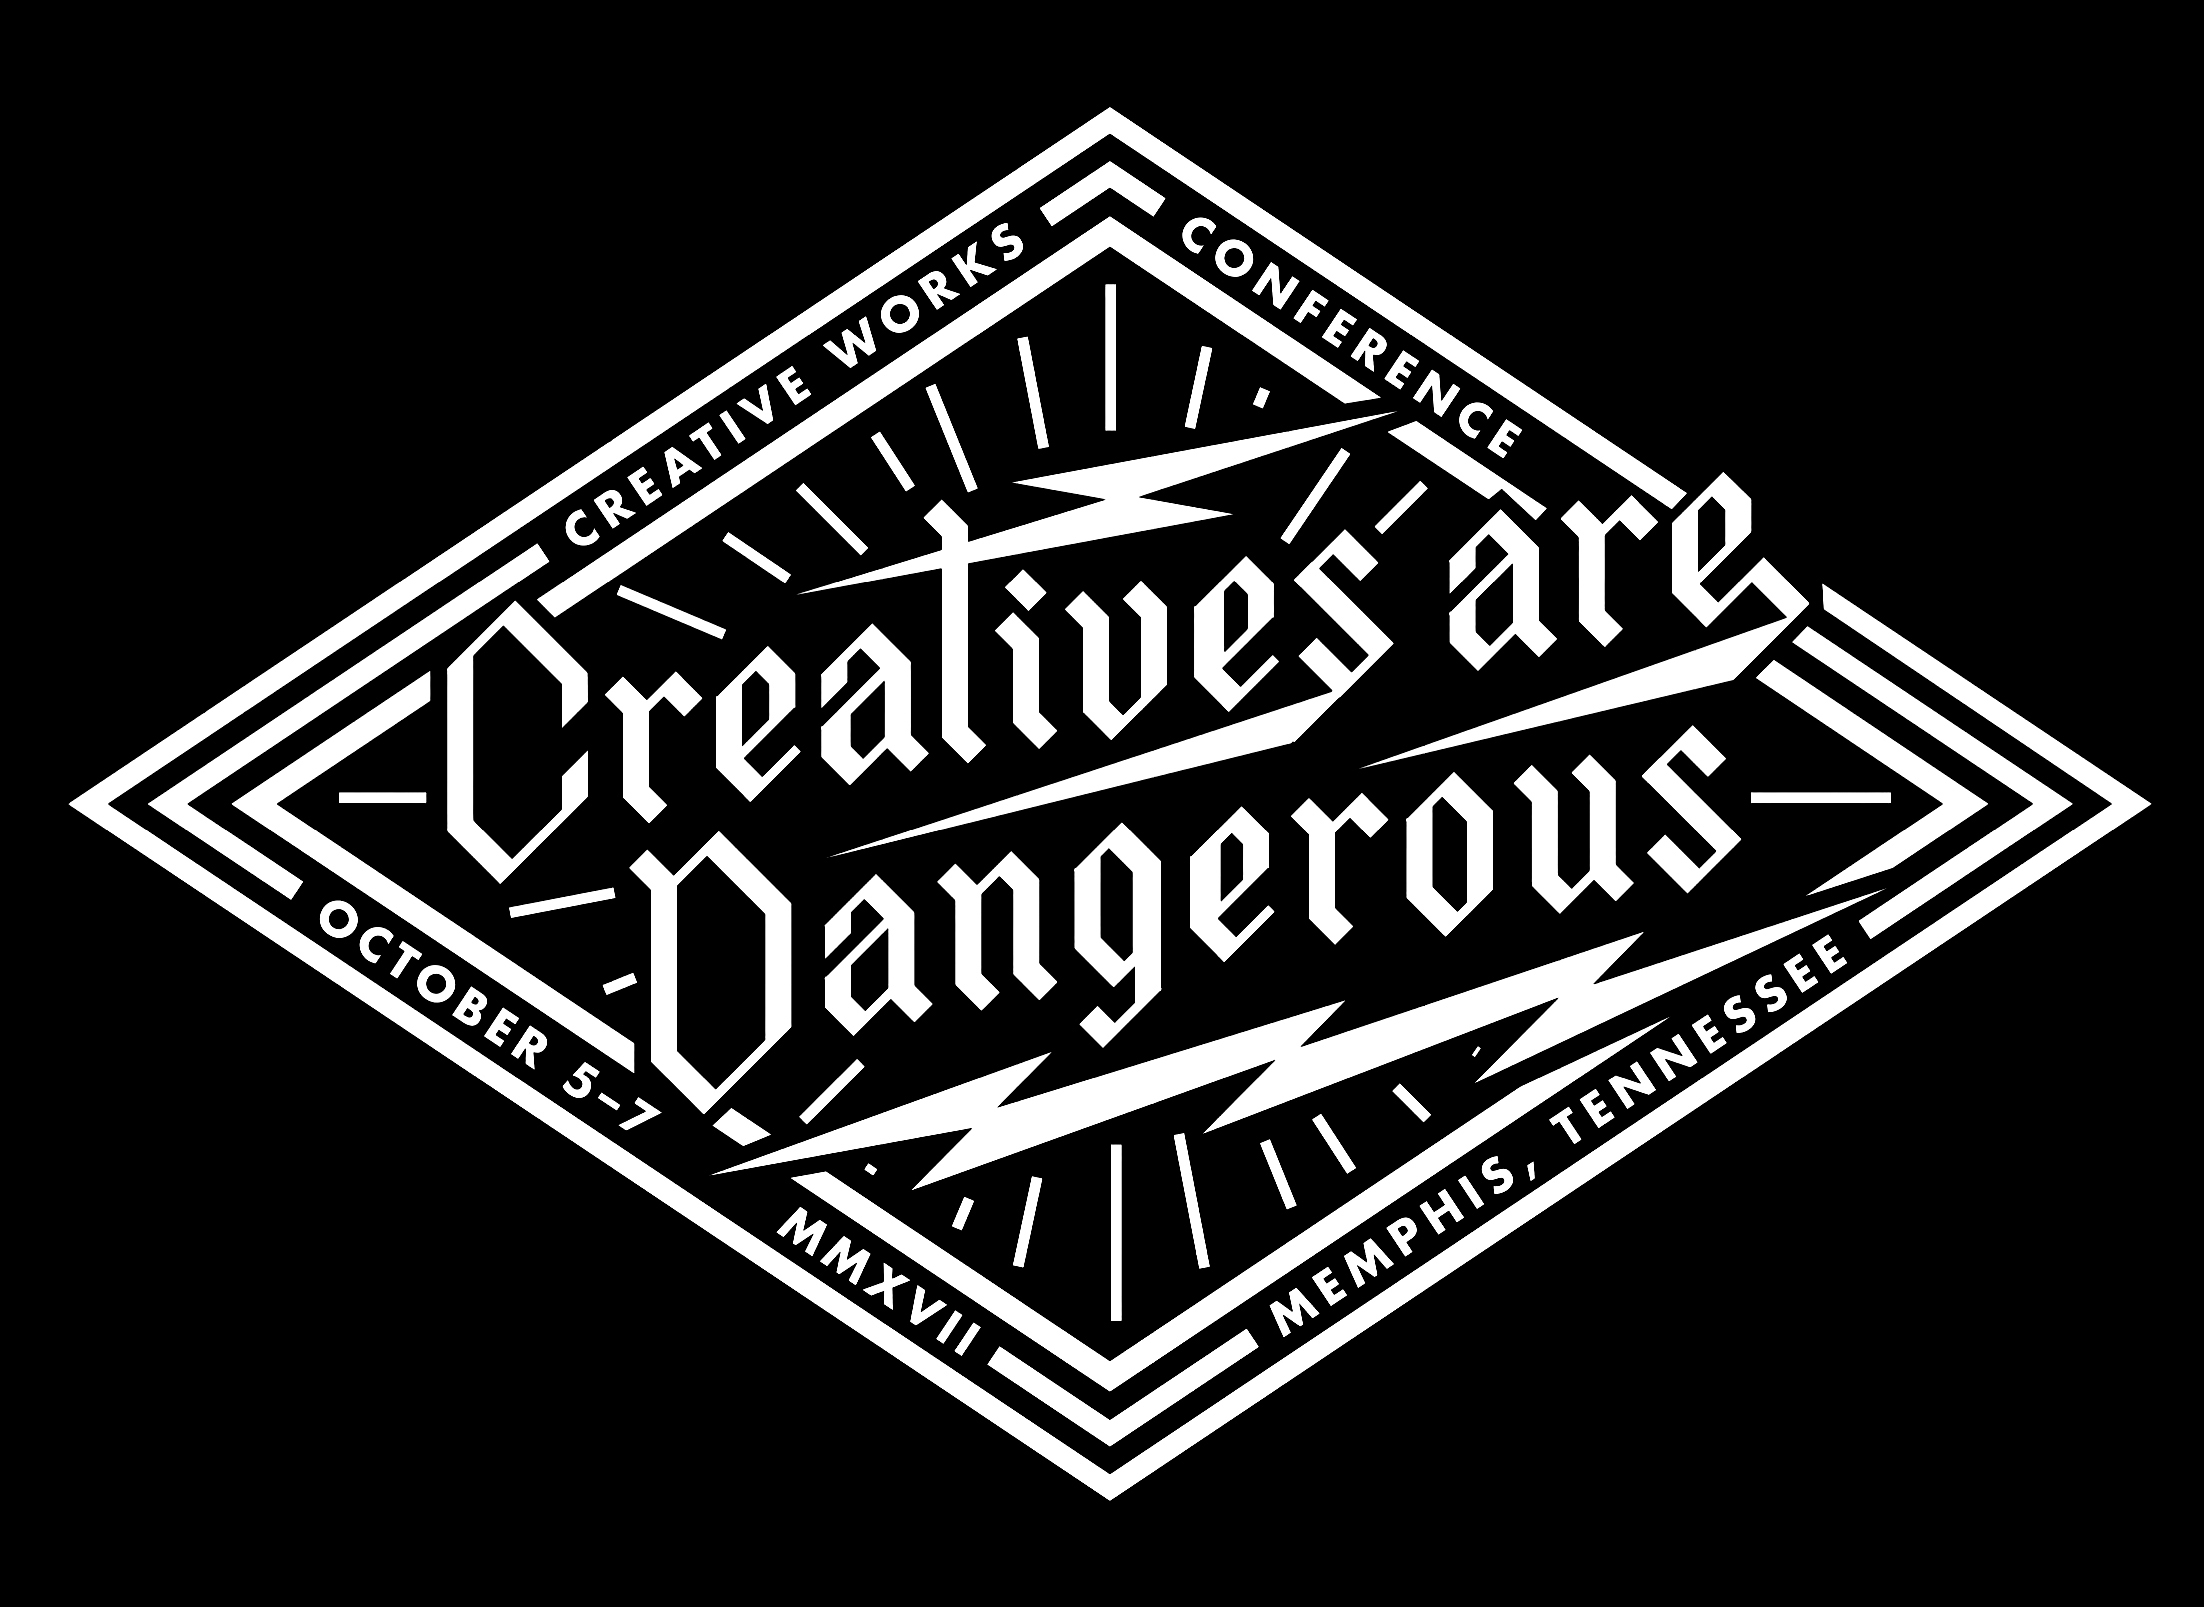 creatives.jpg